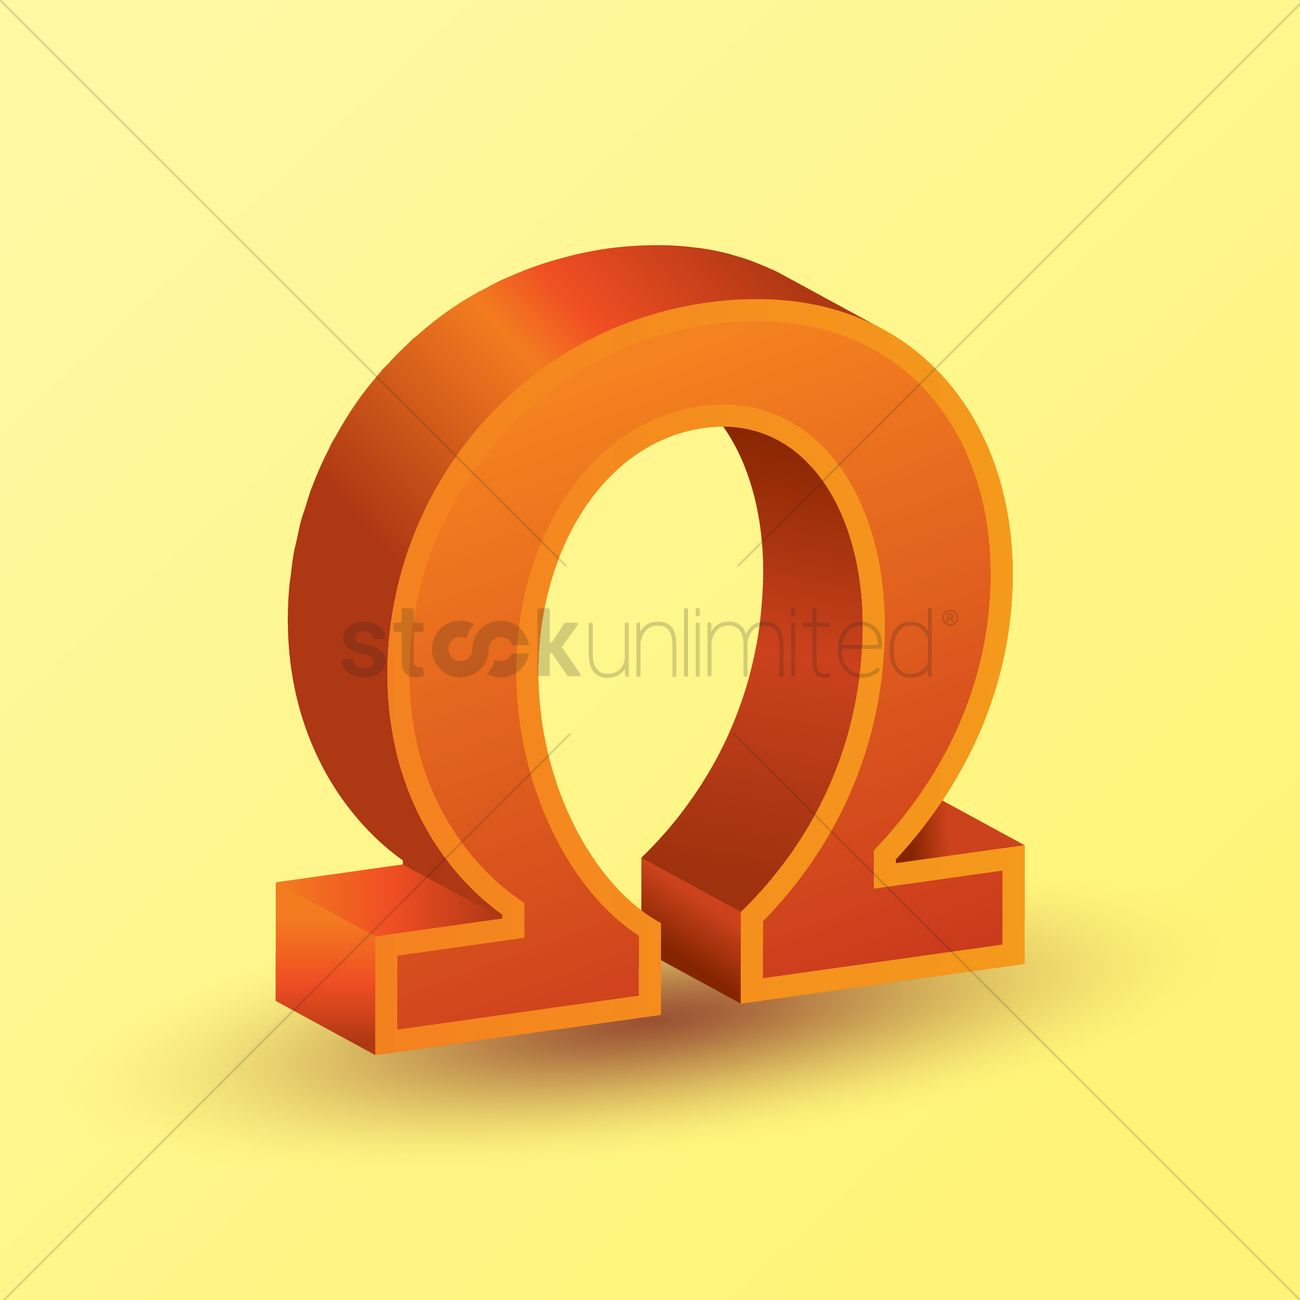 Omega symbol vector image 1631368 stockunlimited omega symbol vector graphic biocorpaavc Gallery